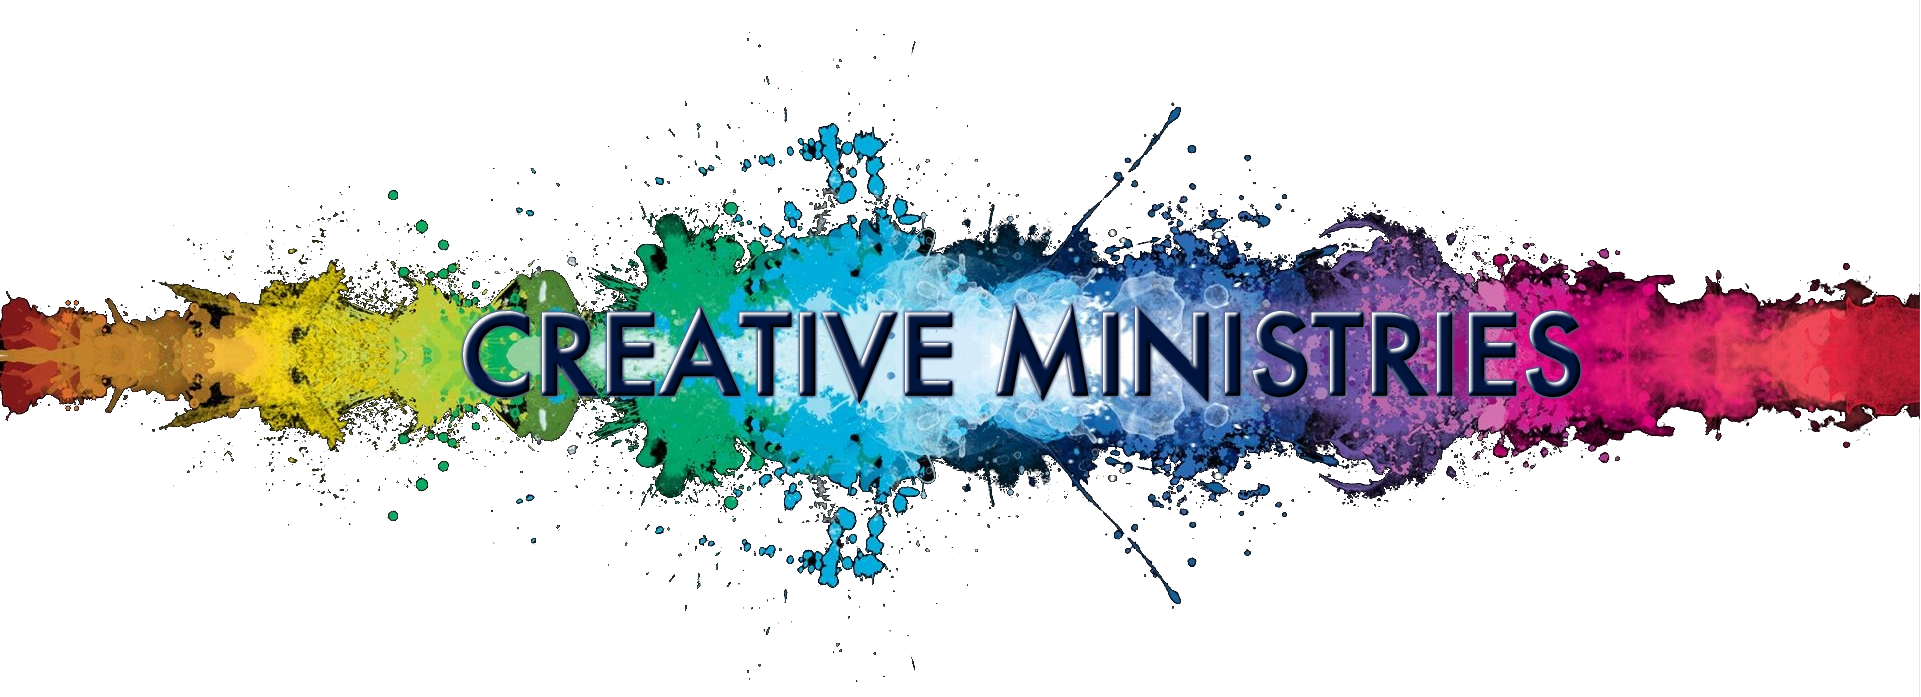 Ministry practice bayou blue. Creative clipart team